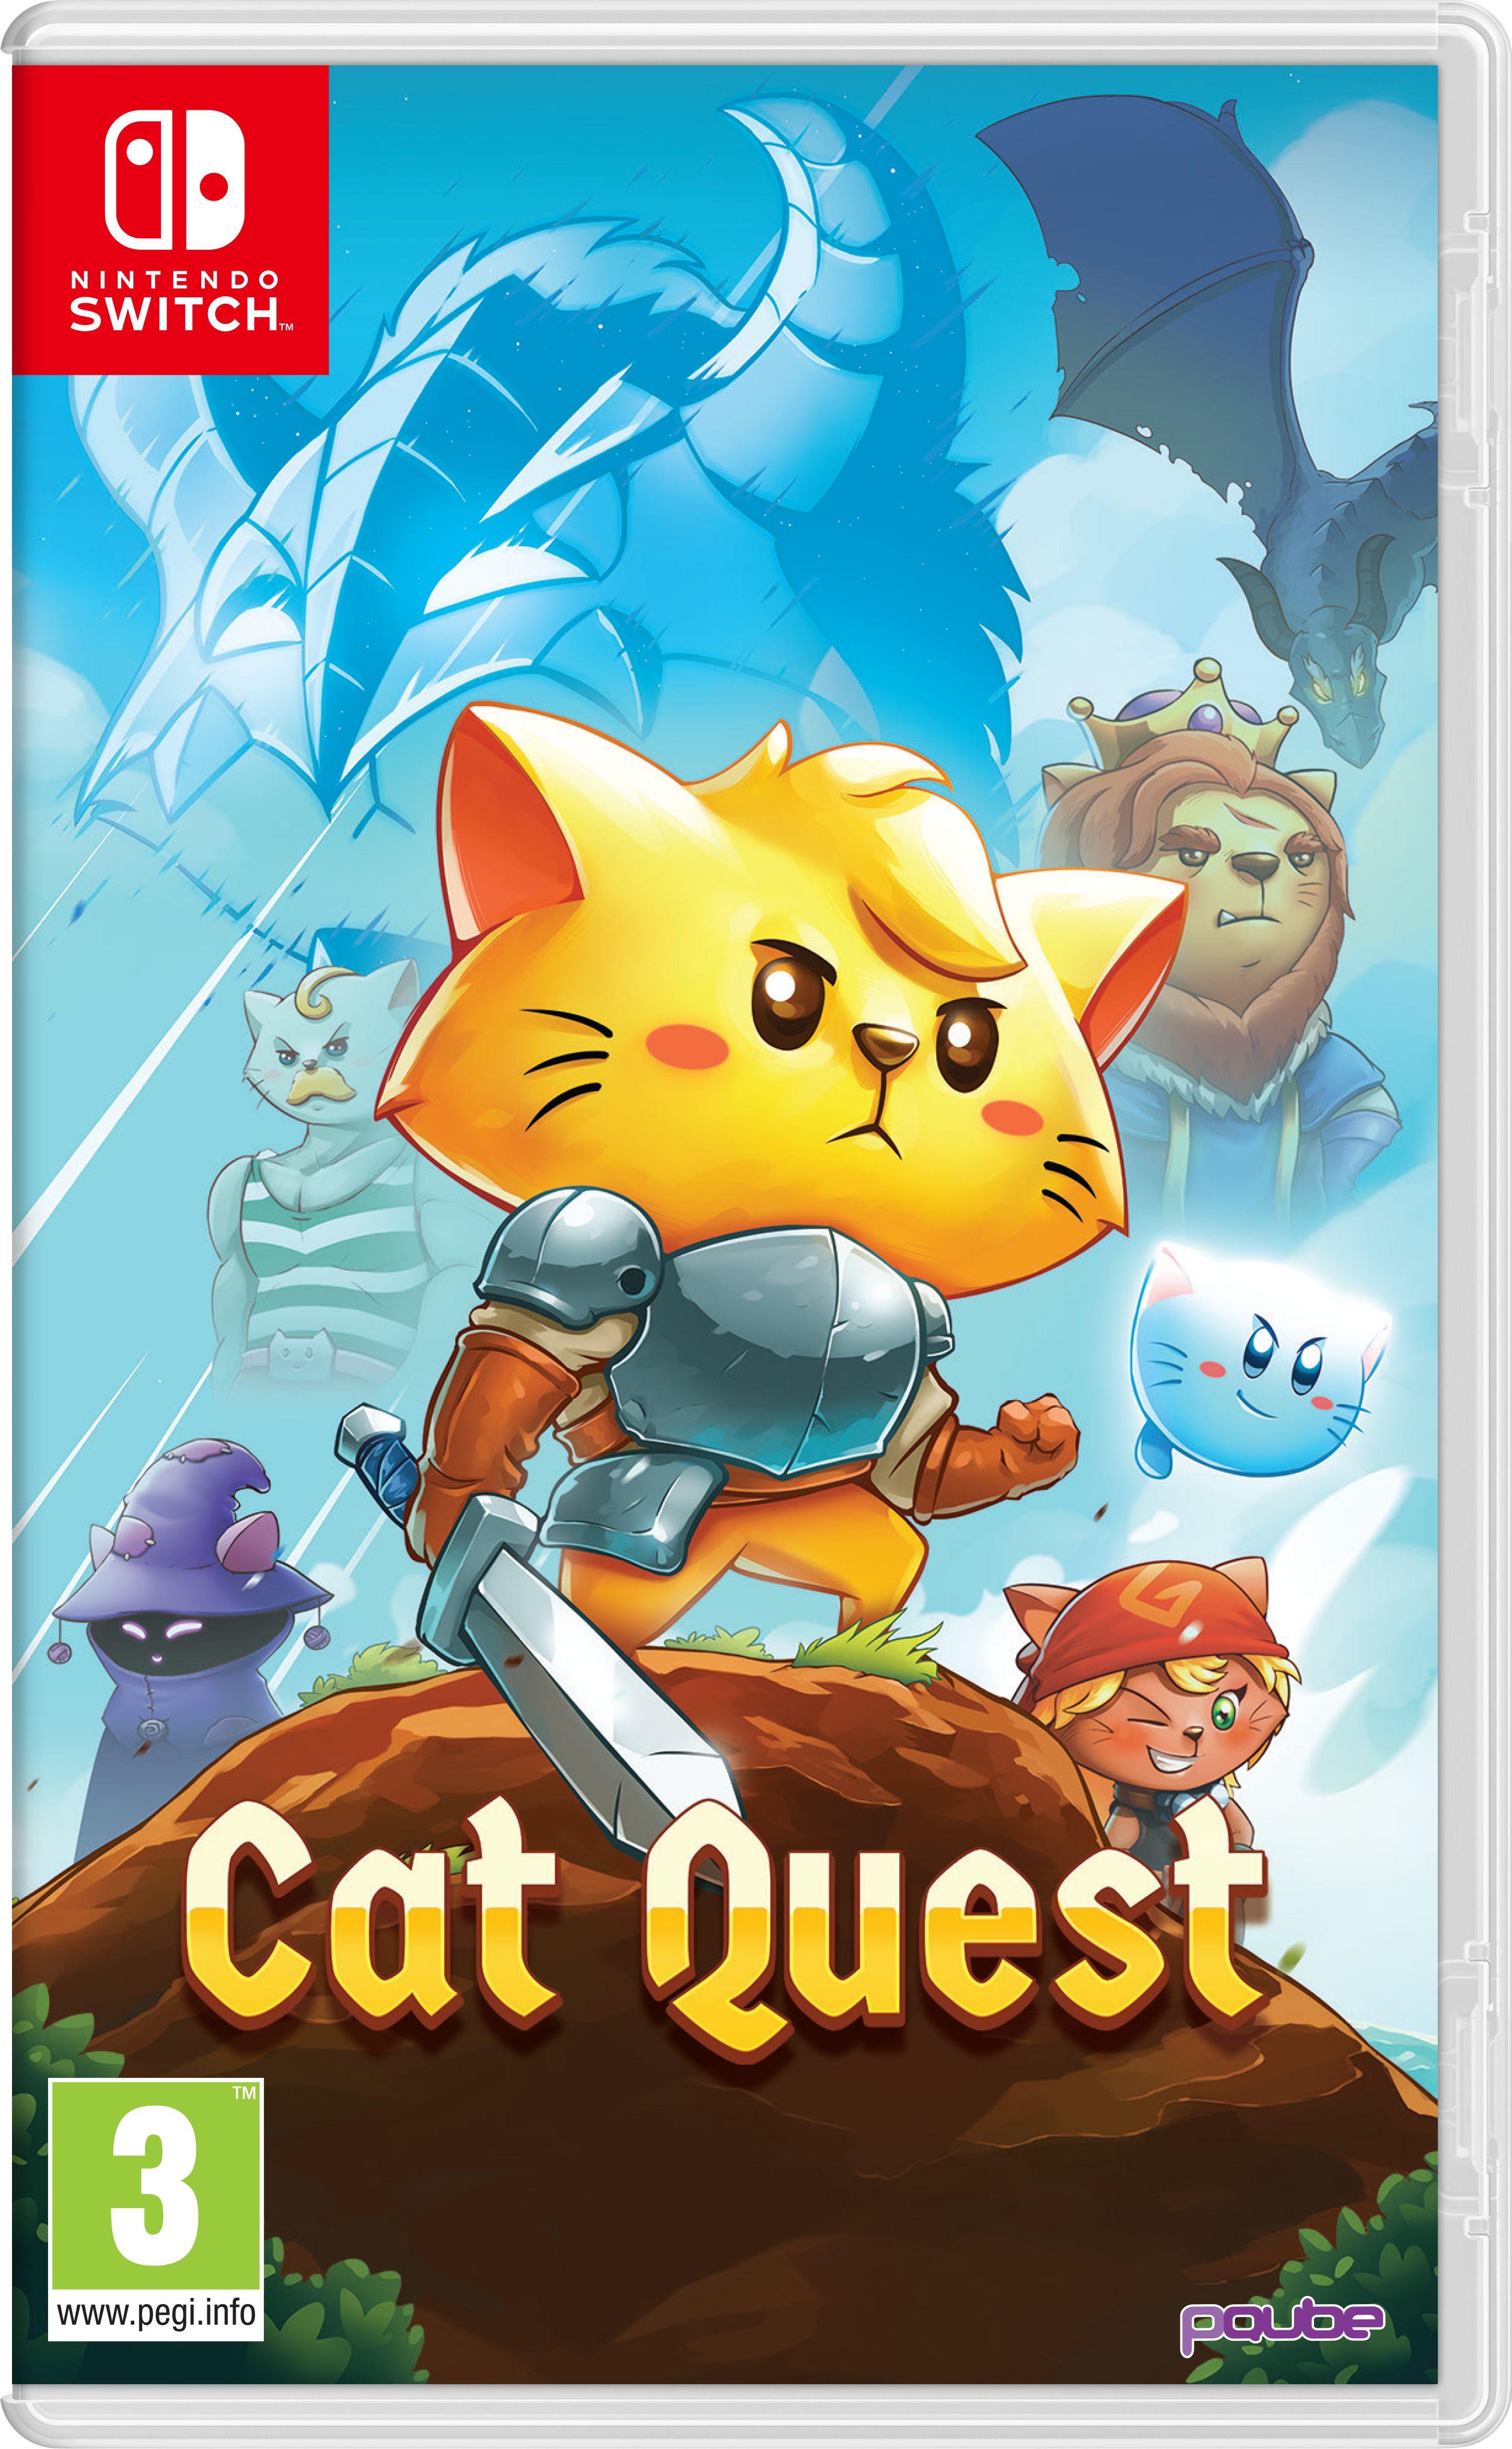 Cat Quest 1 y 2 en Ofertas para Switch (1,39€ SUD)